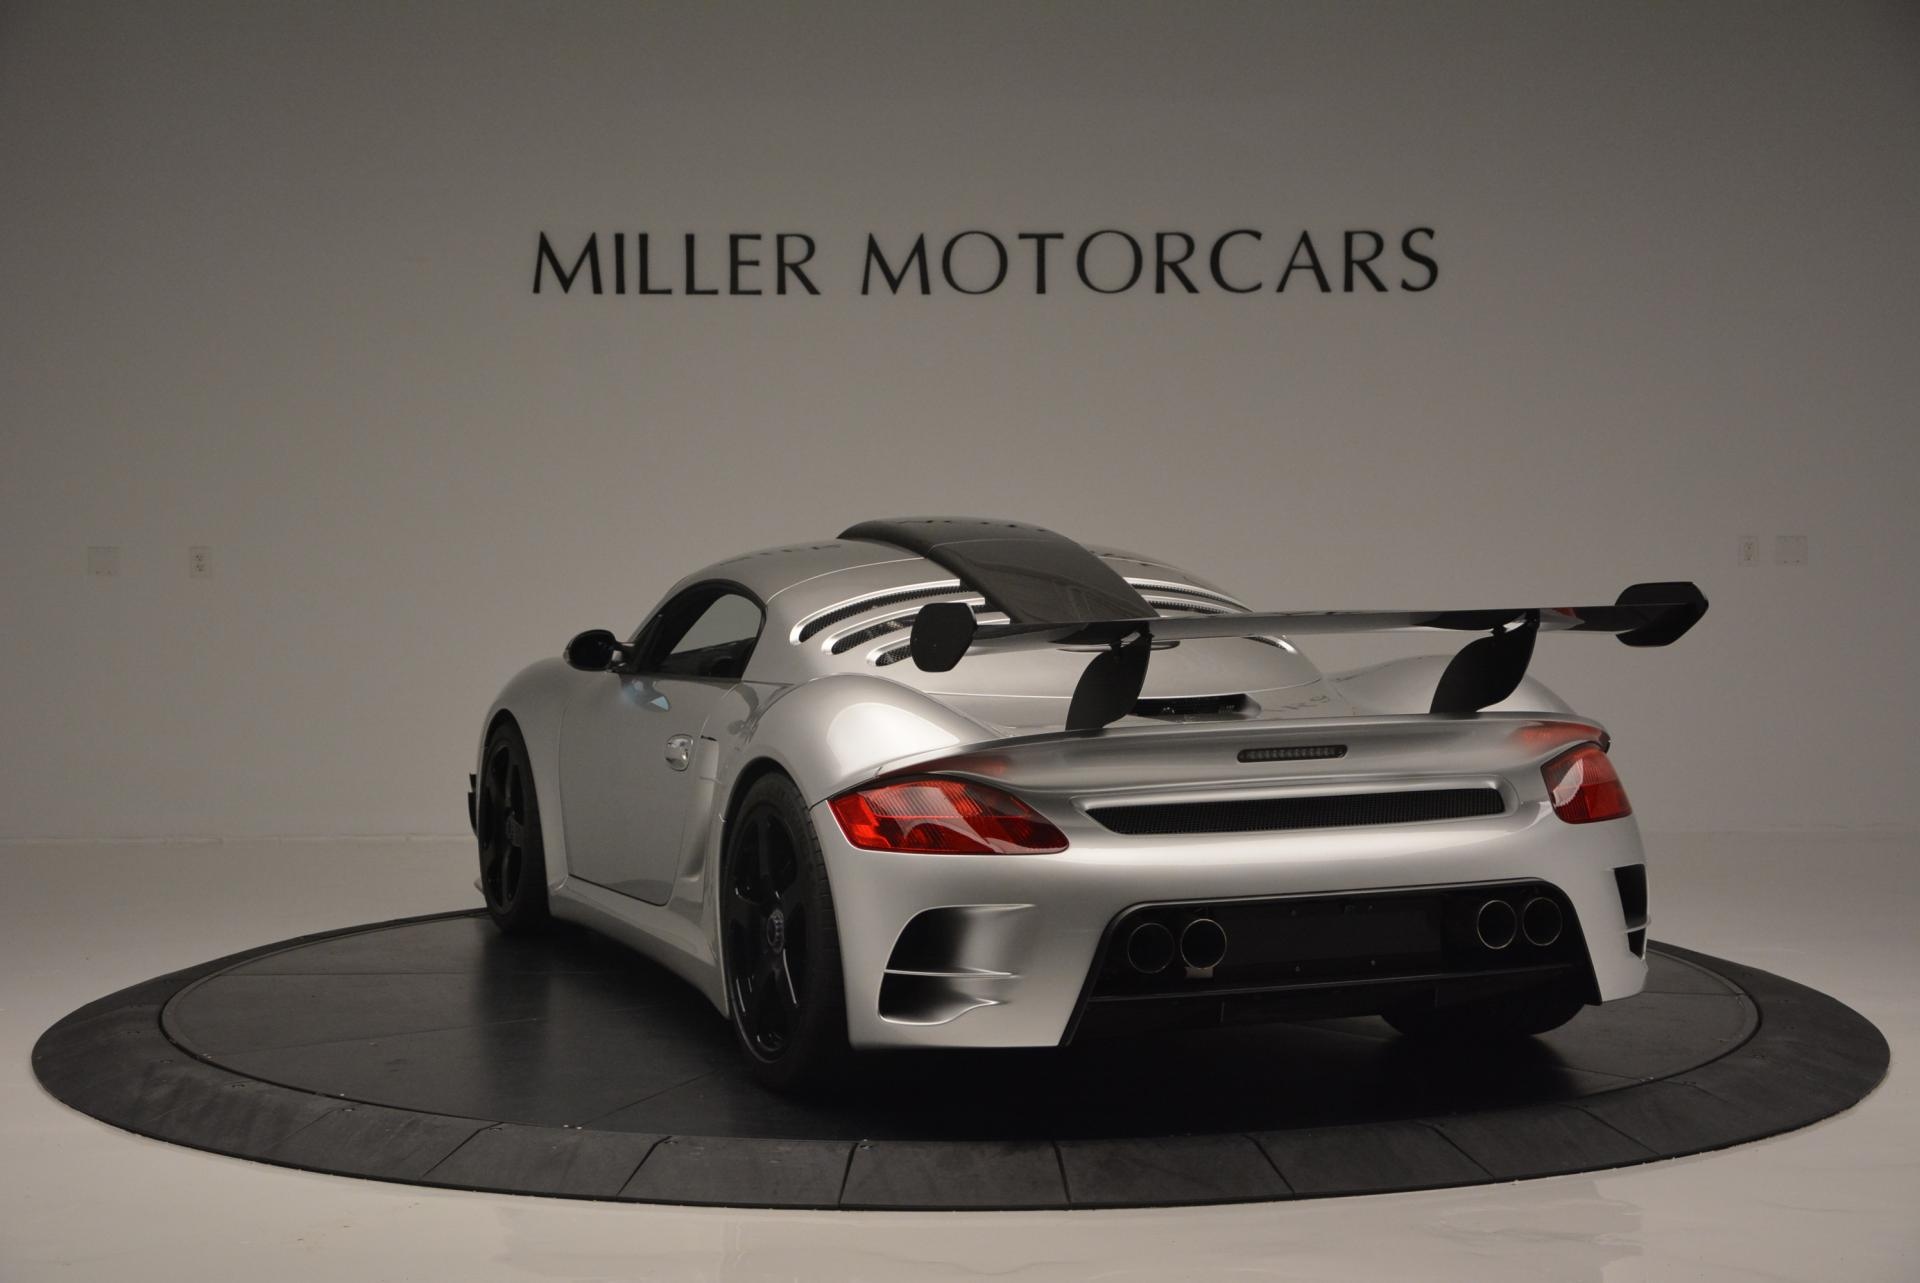 Used 2012 Porsche RUF CTR-3 Clubsport For Sale In Westport, CT 110_p5